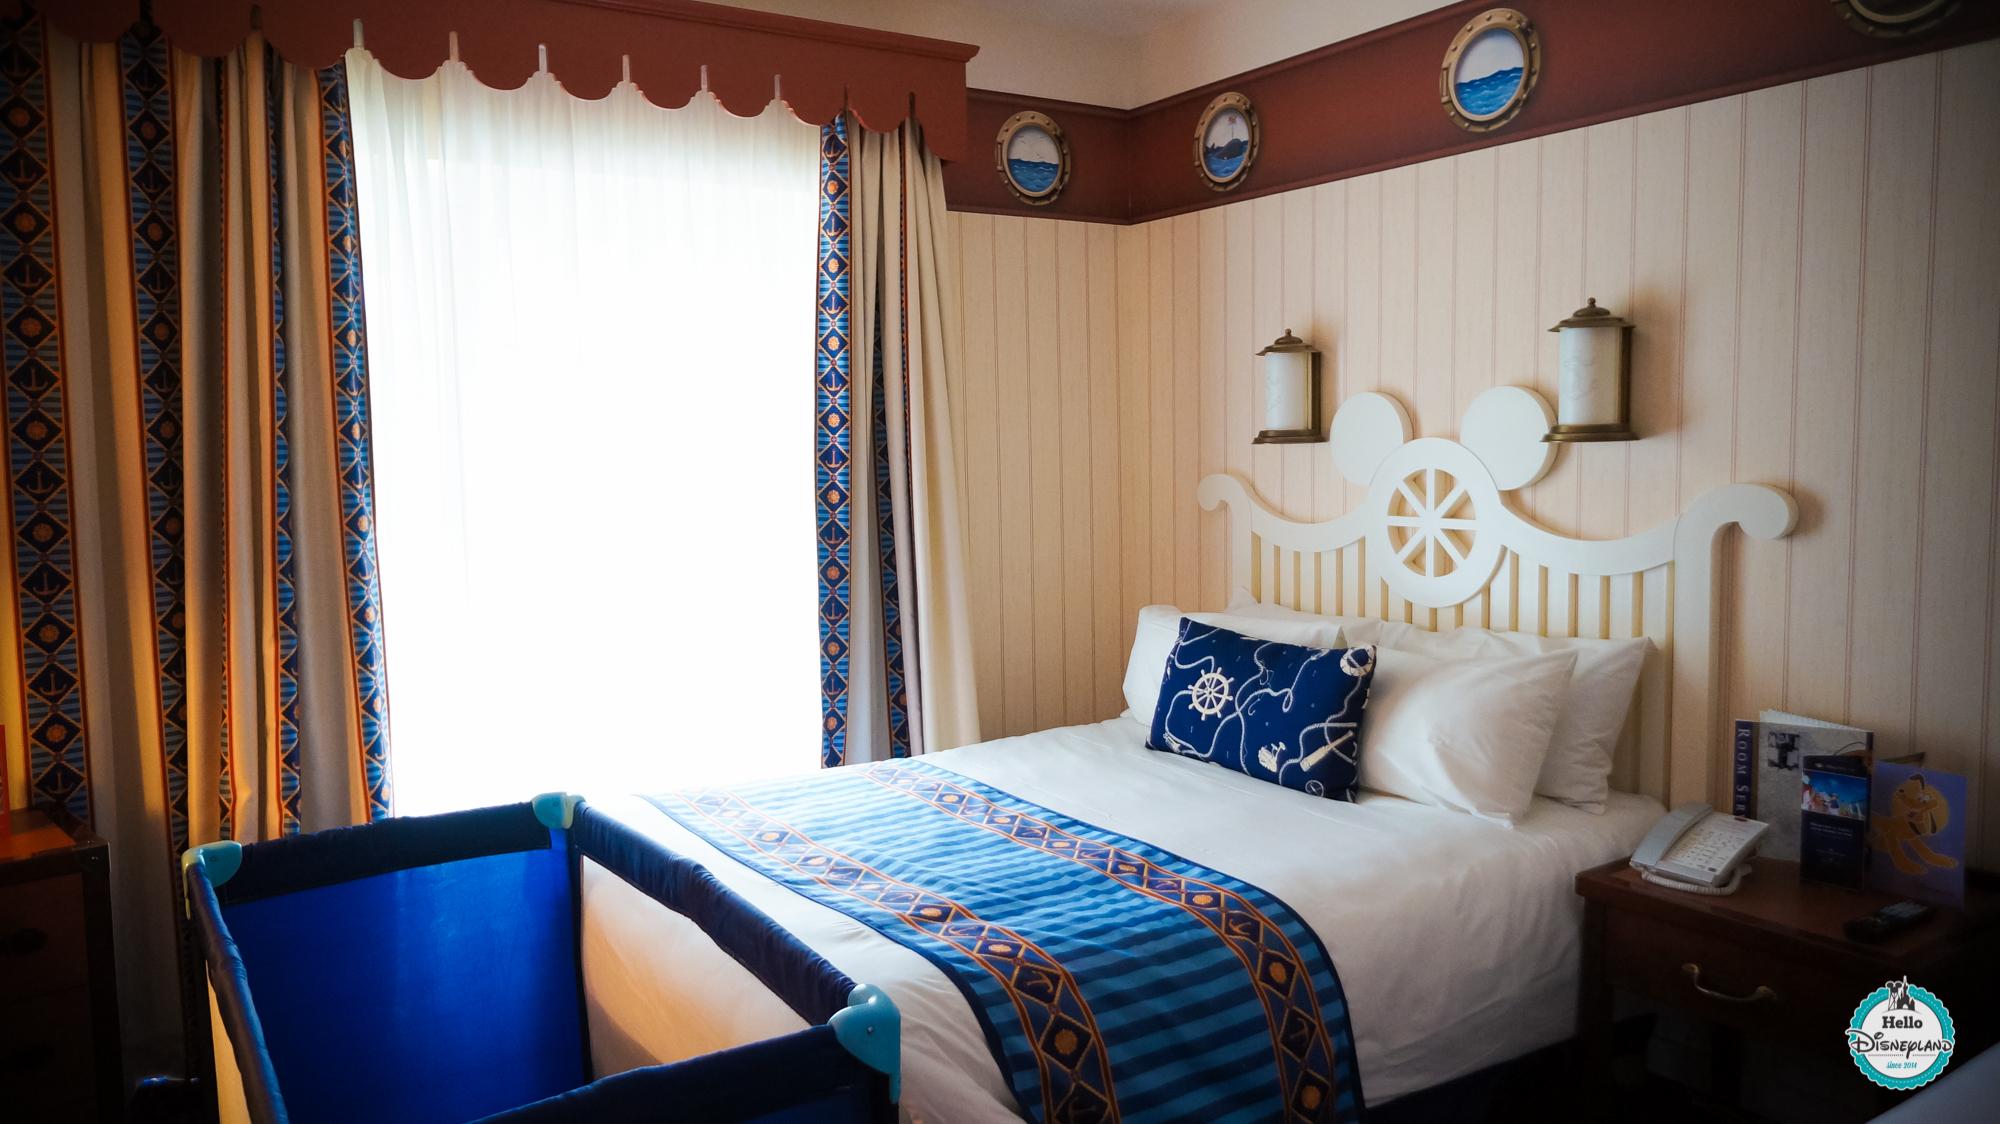 Salle De Bain Hotel Cheyenne Disney ~ hello disneyland le blog n 1 sur disneyland paris disney s